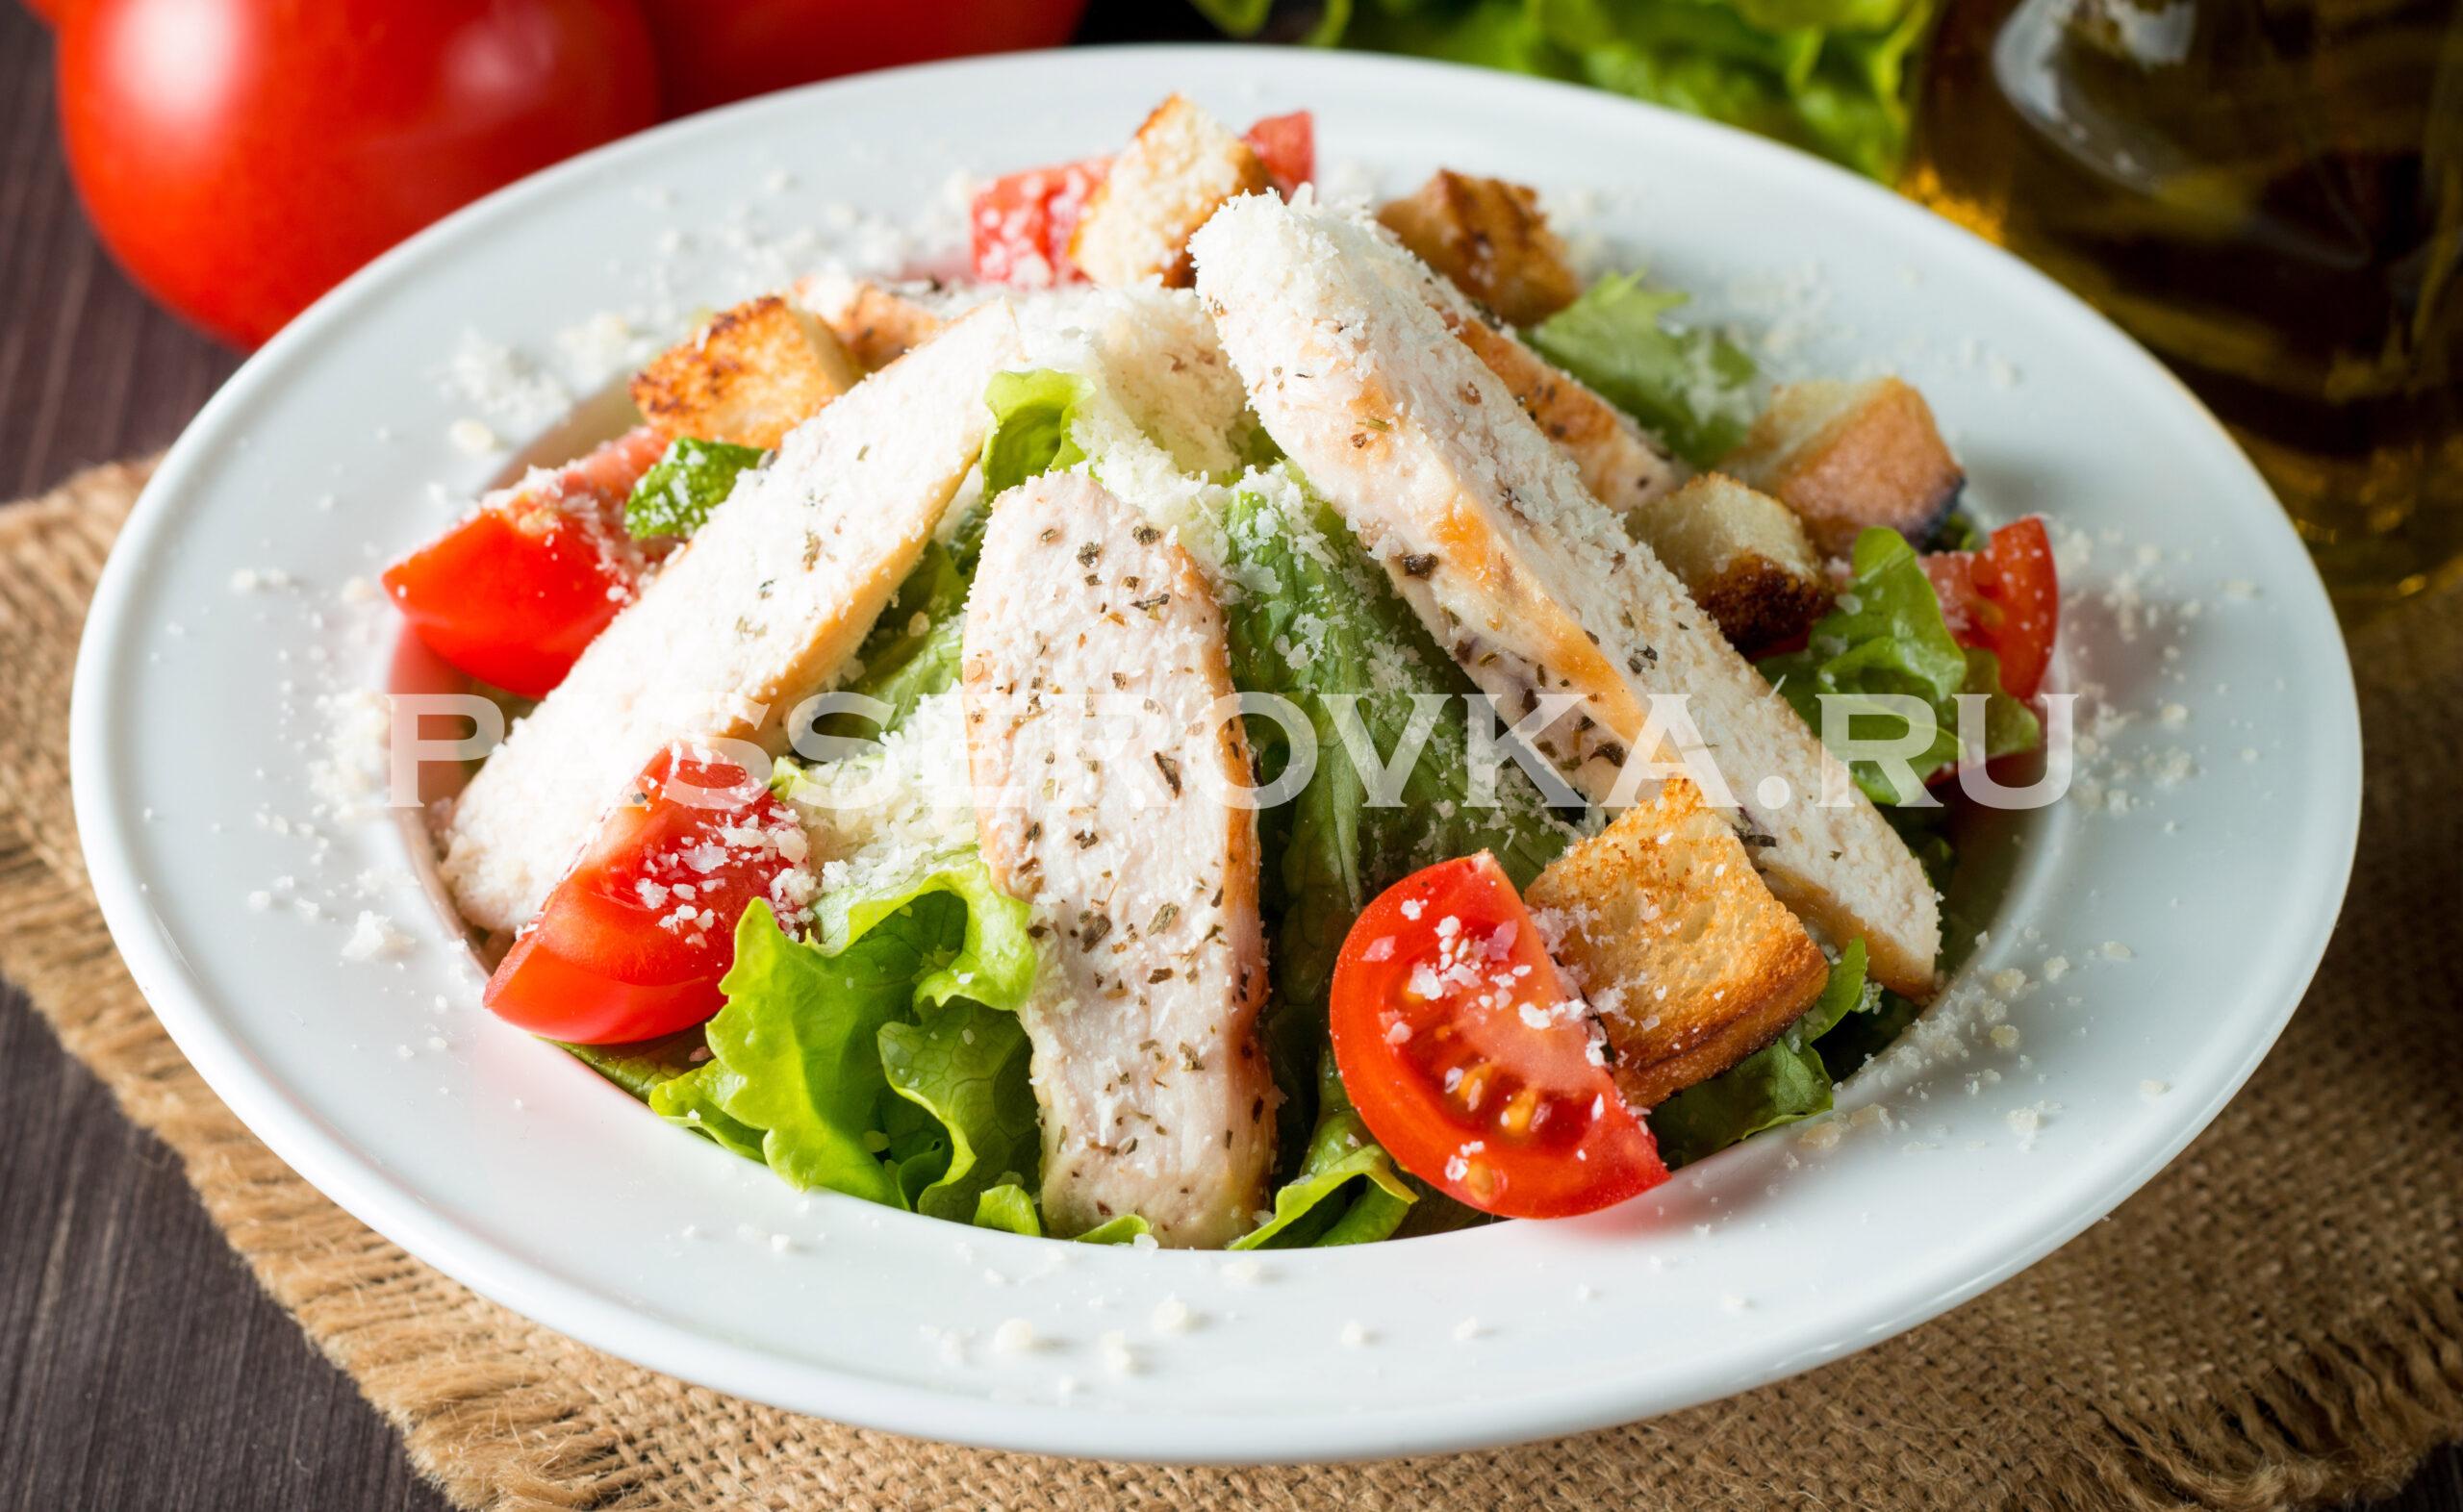 Рецепт салата цезарь с курицей и сухариками в домашних условиях